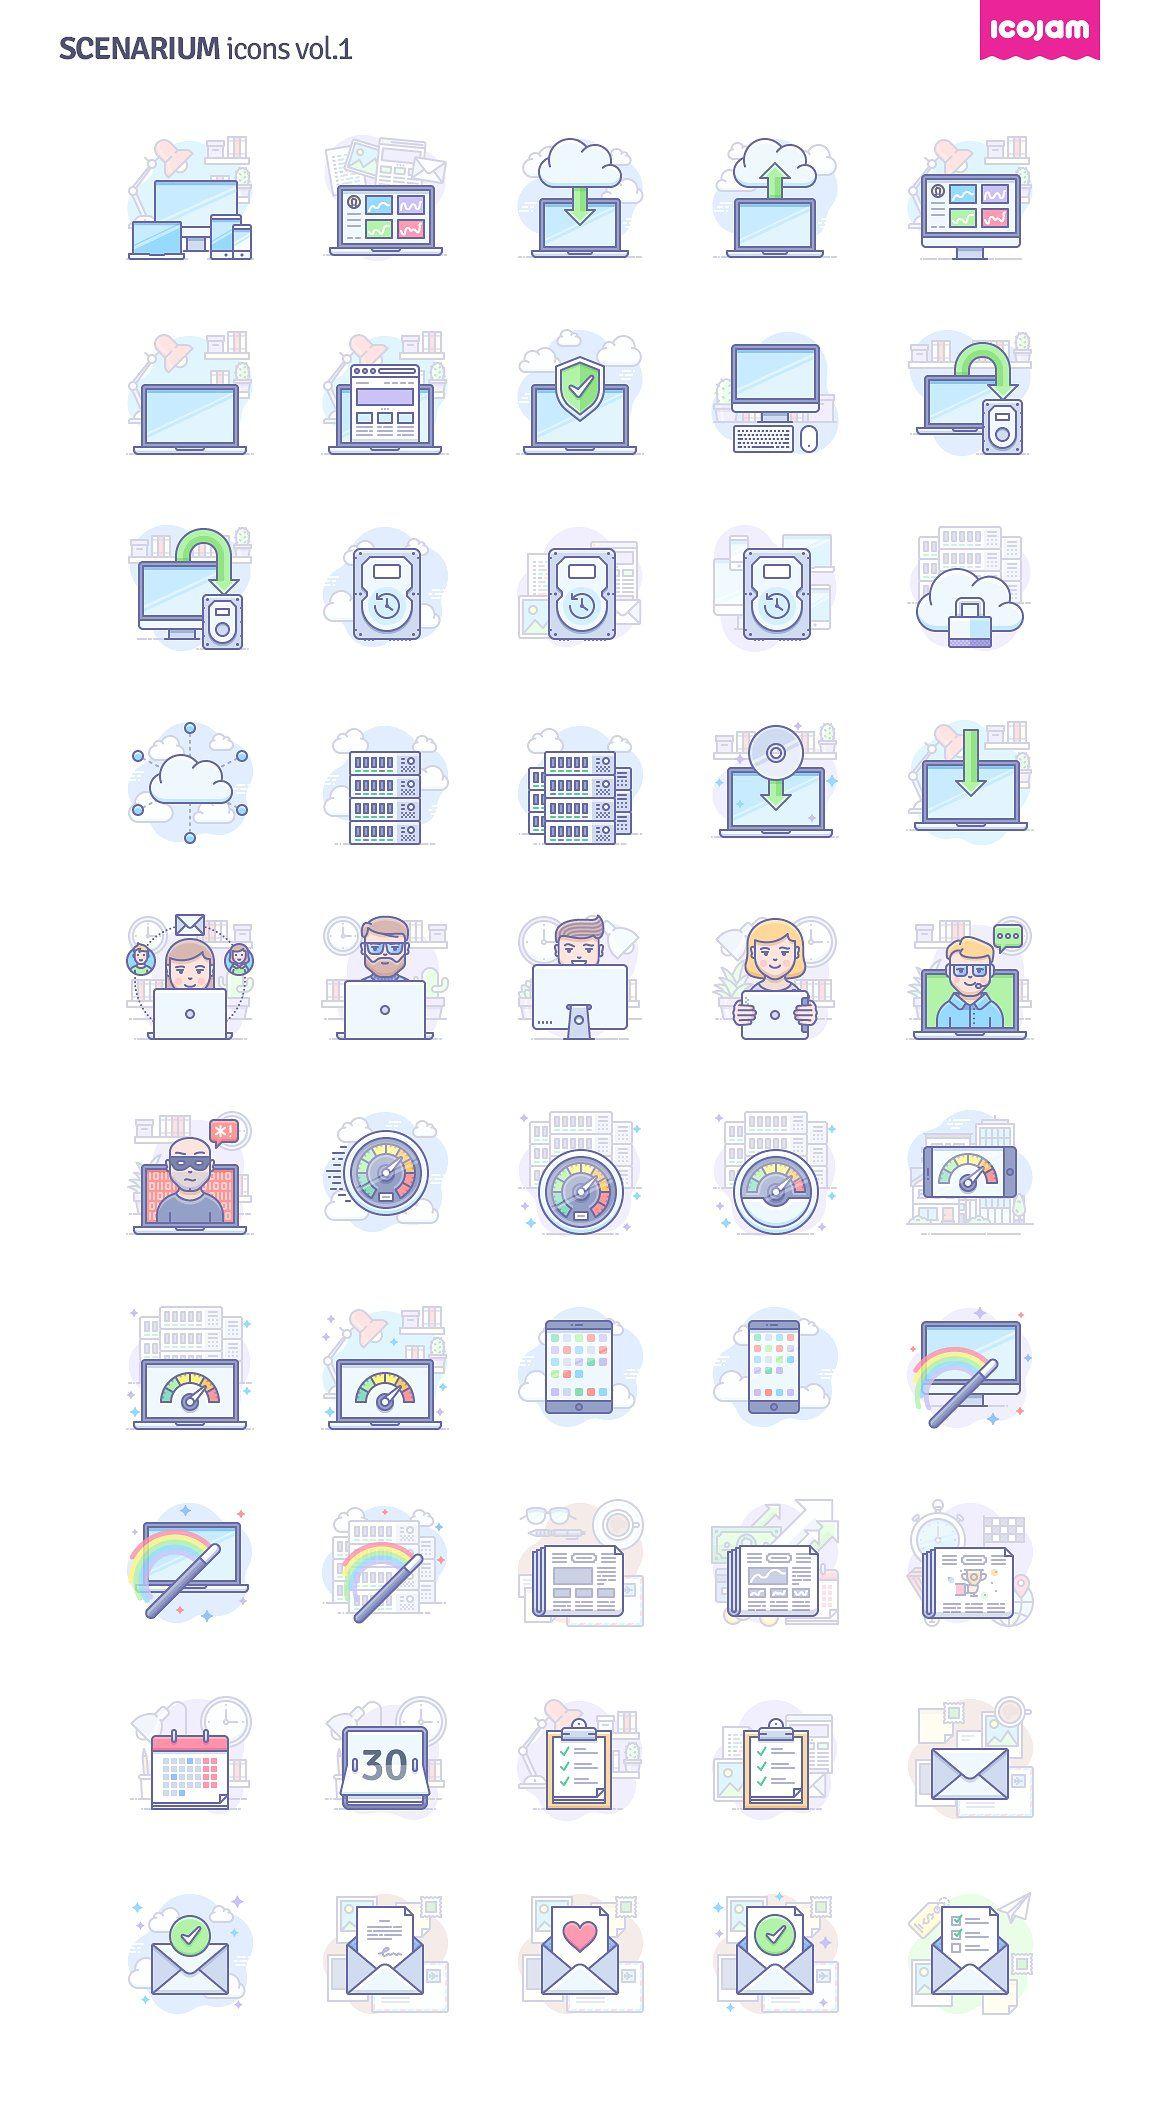 Scenarium icons vol.1 icon, flaticon, icons, icon pack